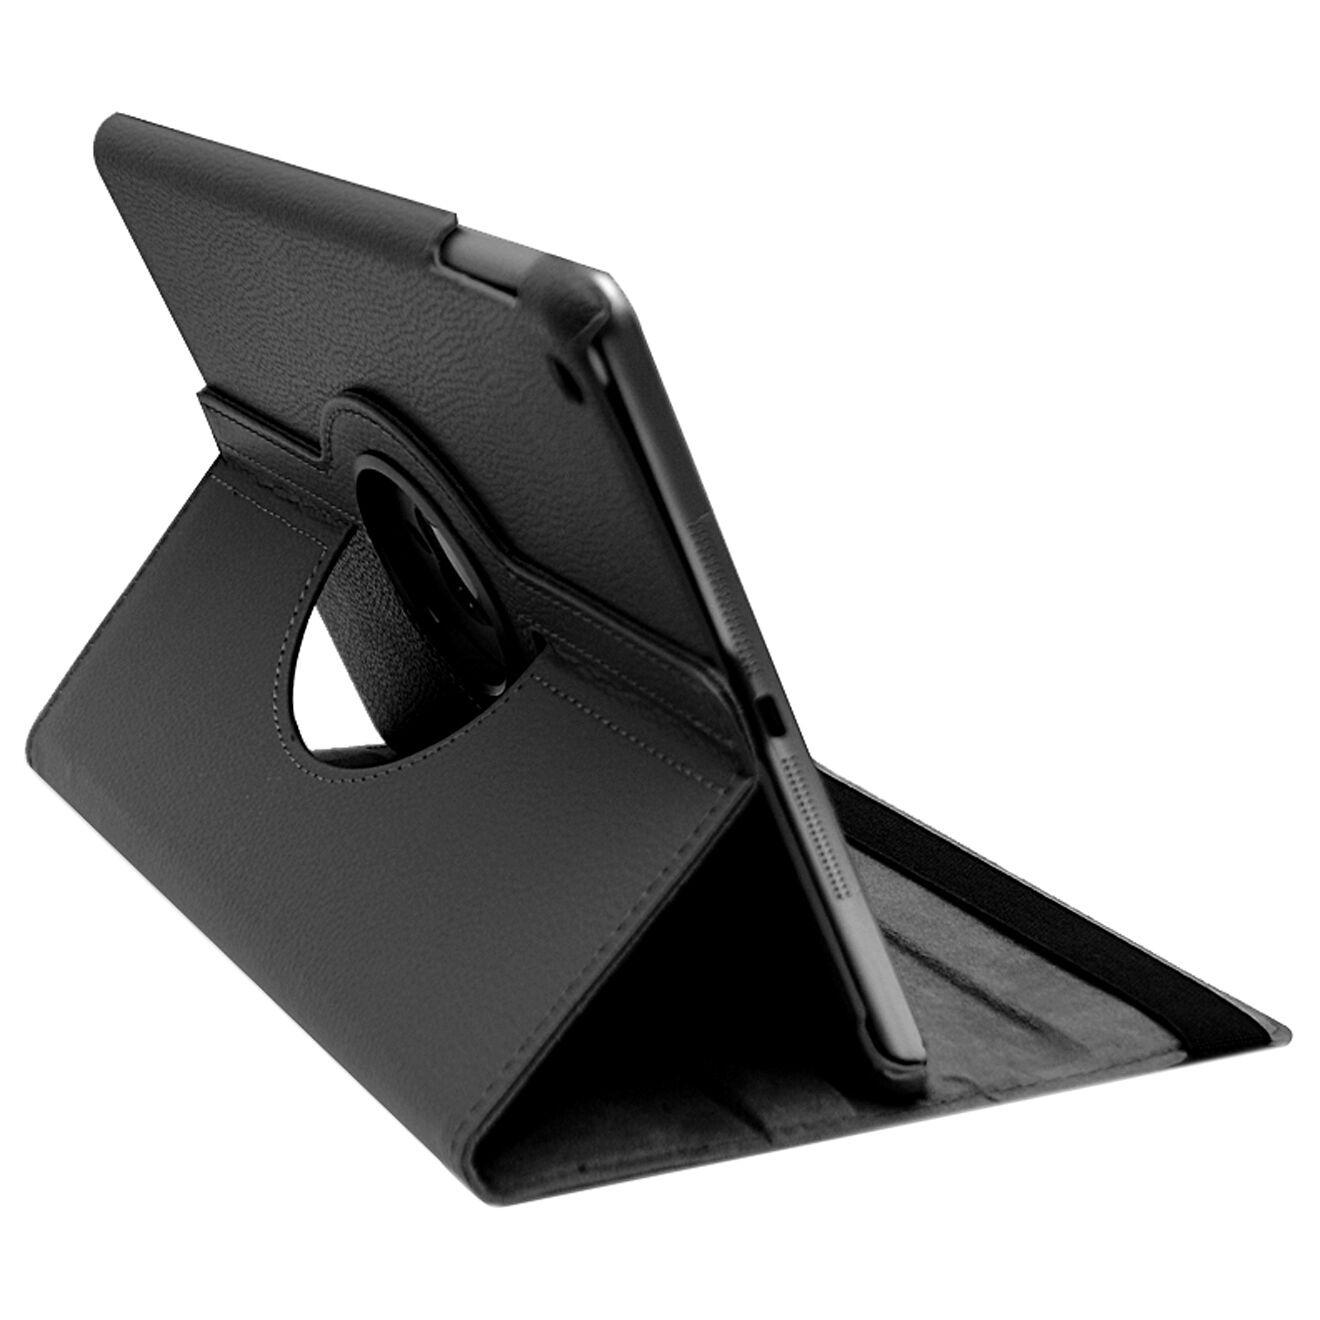 Inki Housse iPad Air 2 - noire